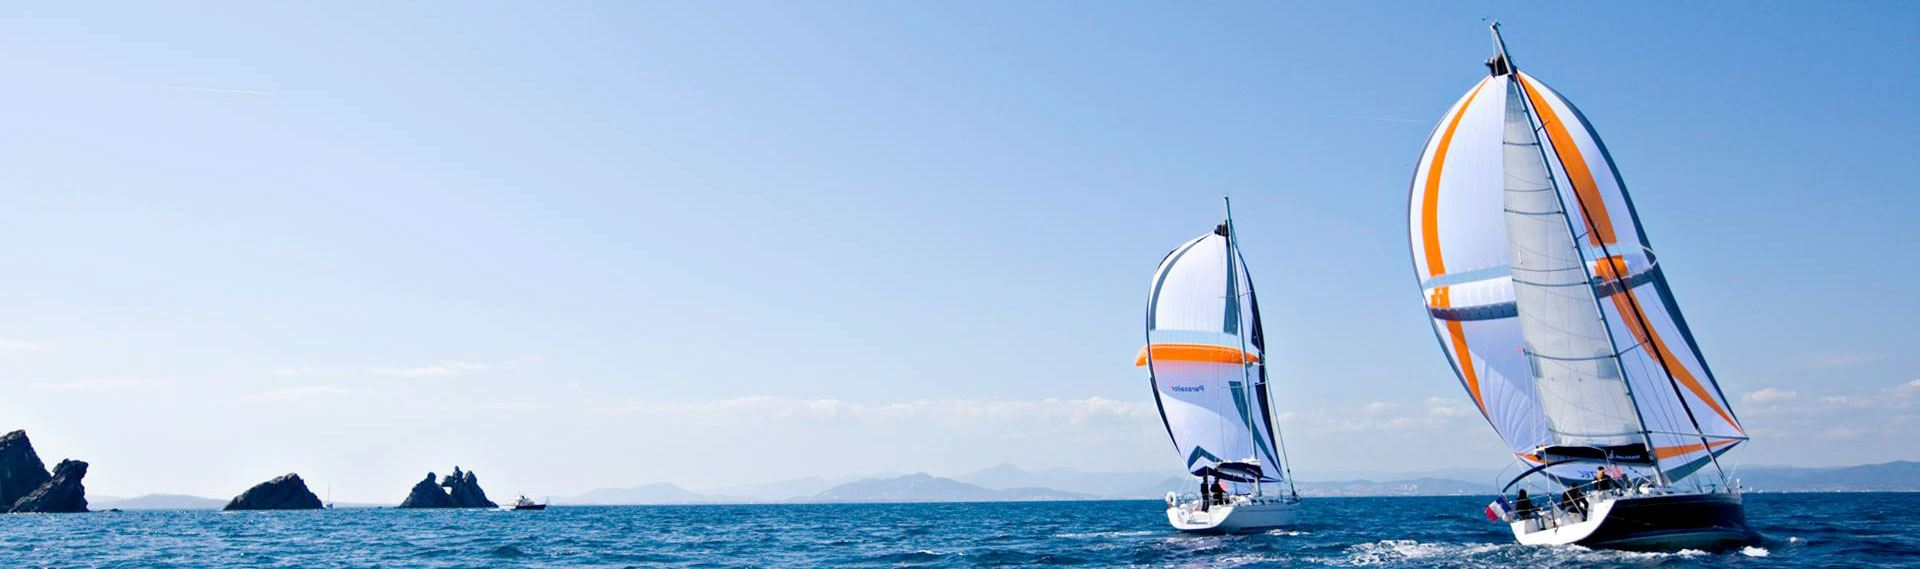 Marine Store Sardegna Olbia accessori nautici